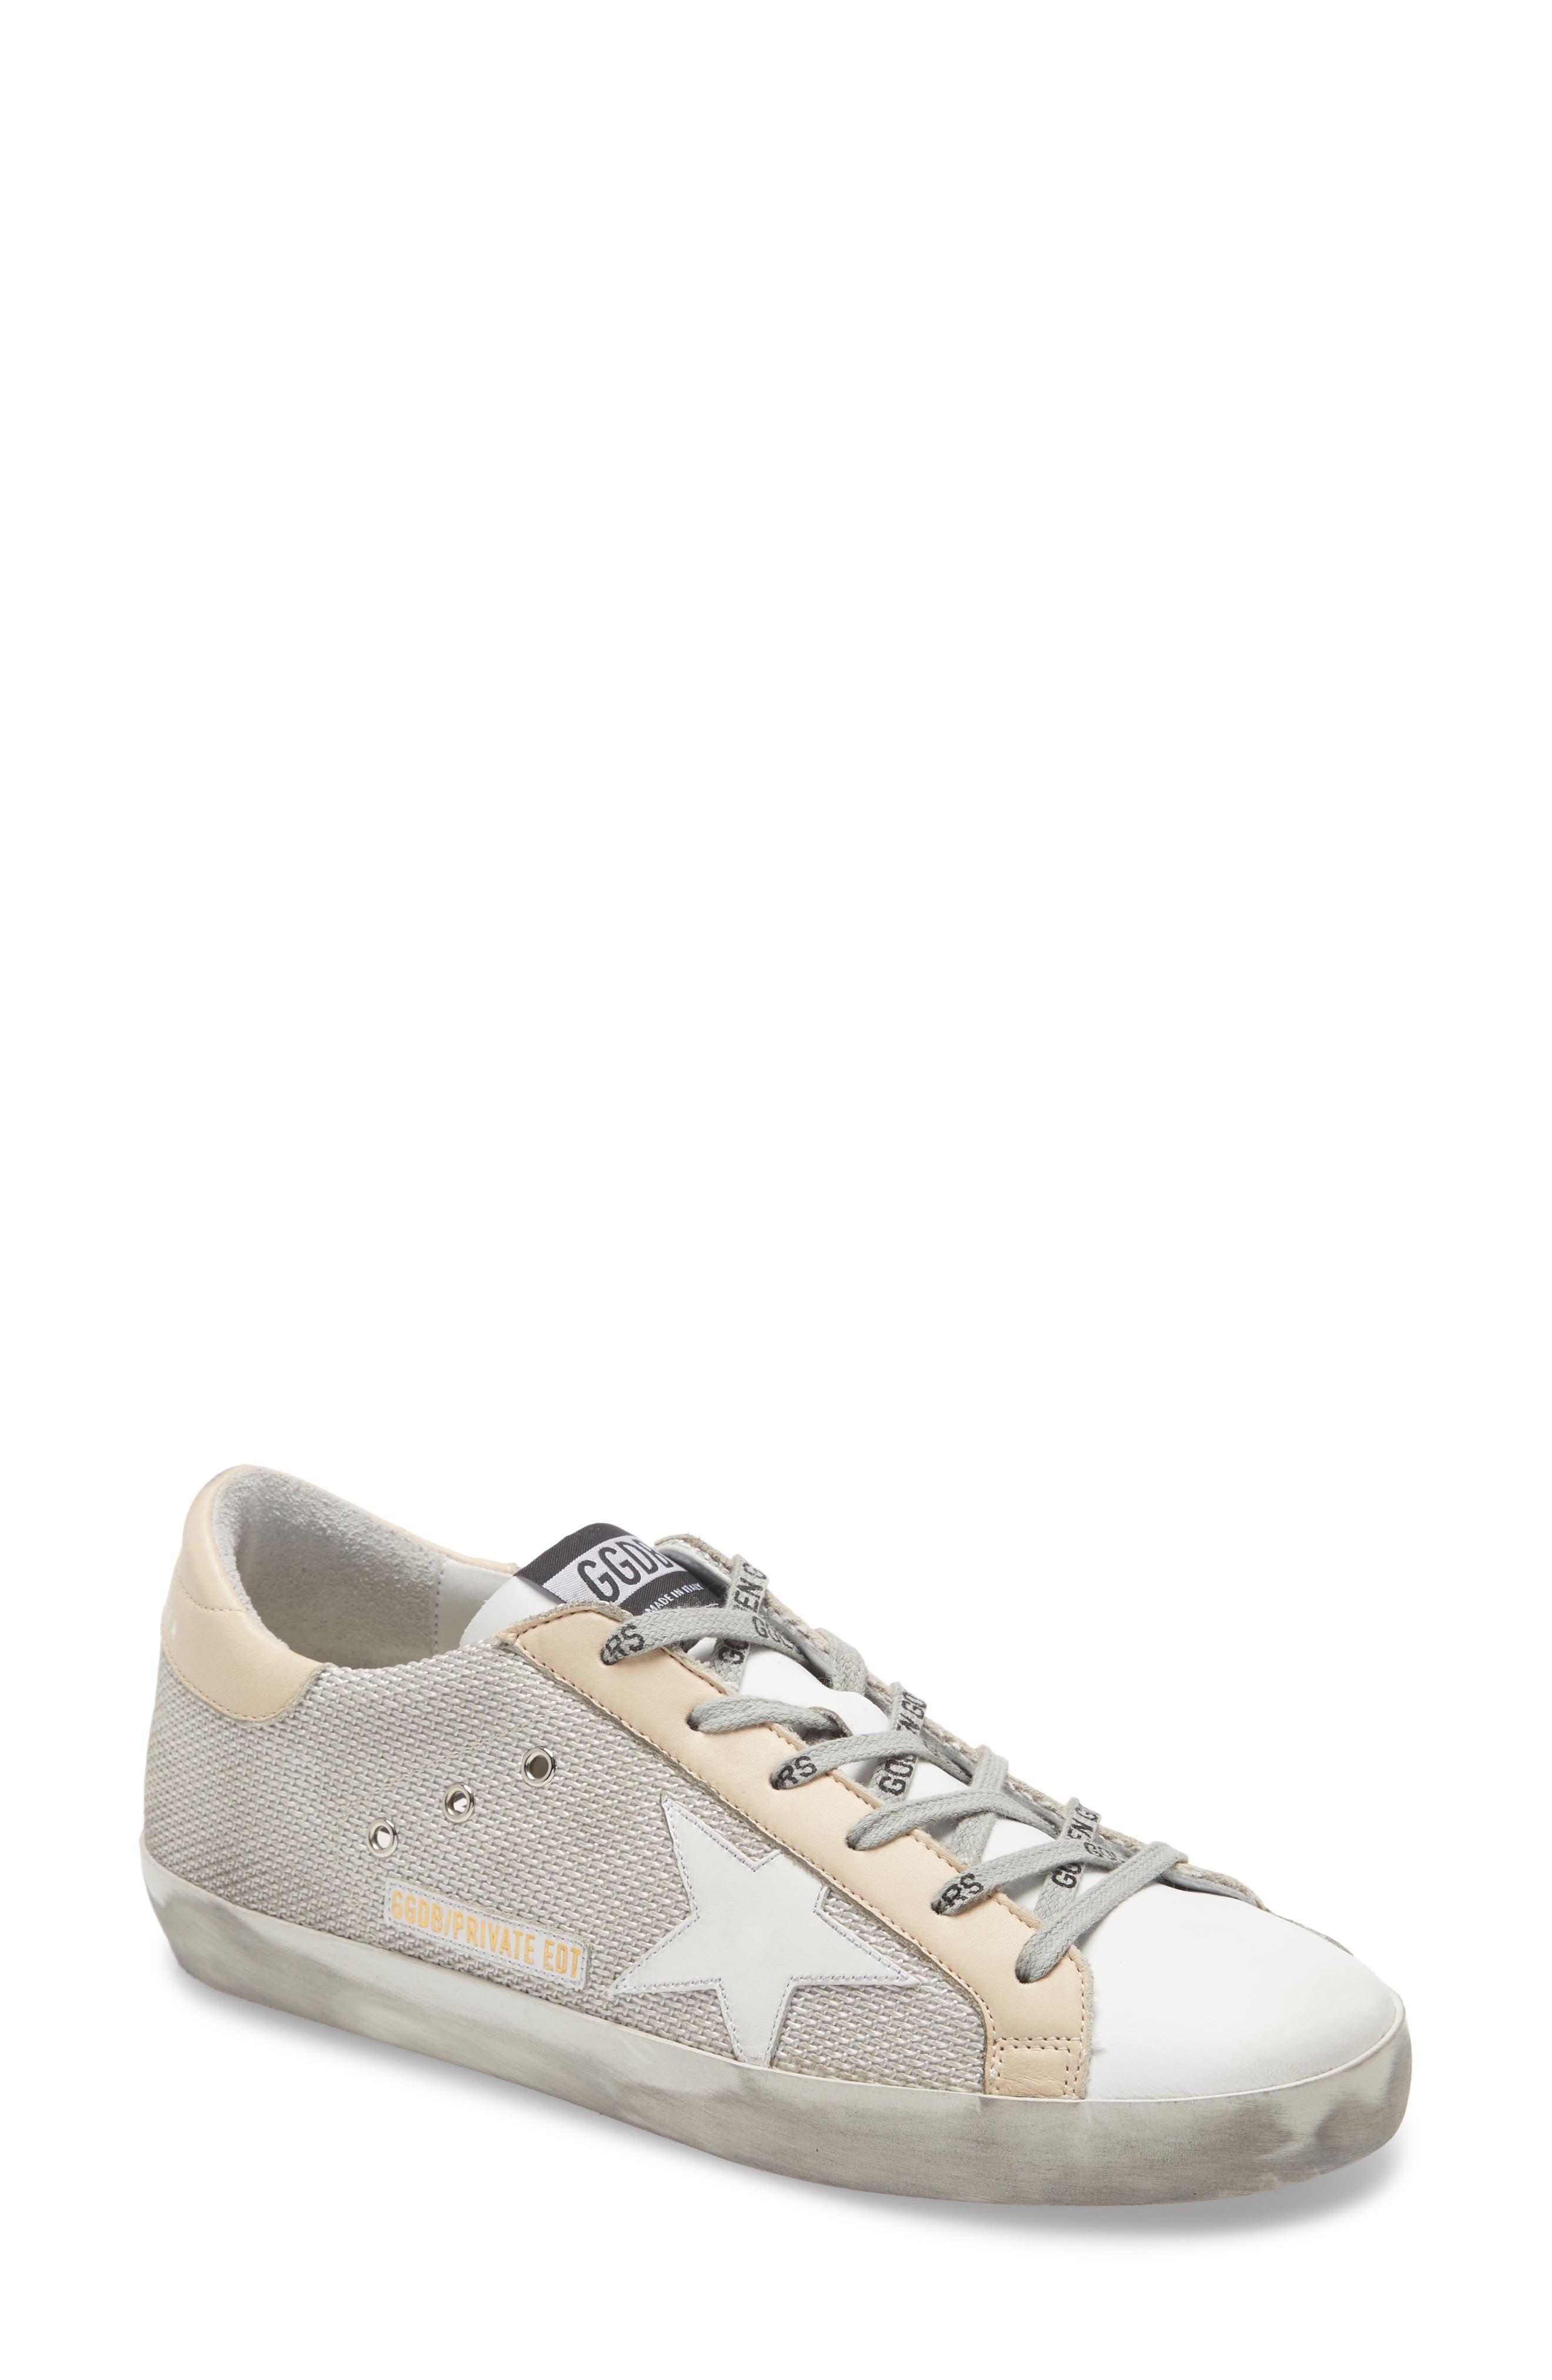 Women's White Golden Goose Shoes